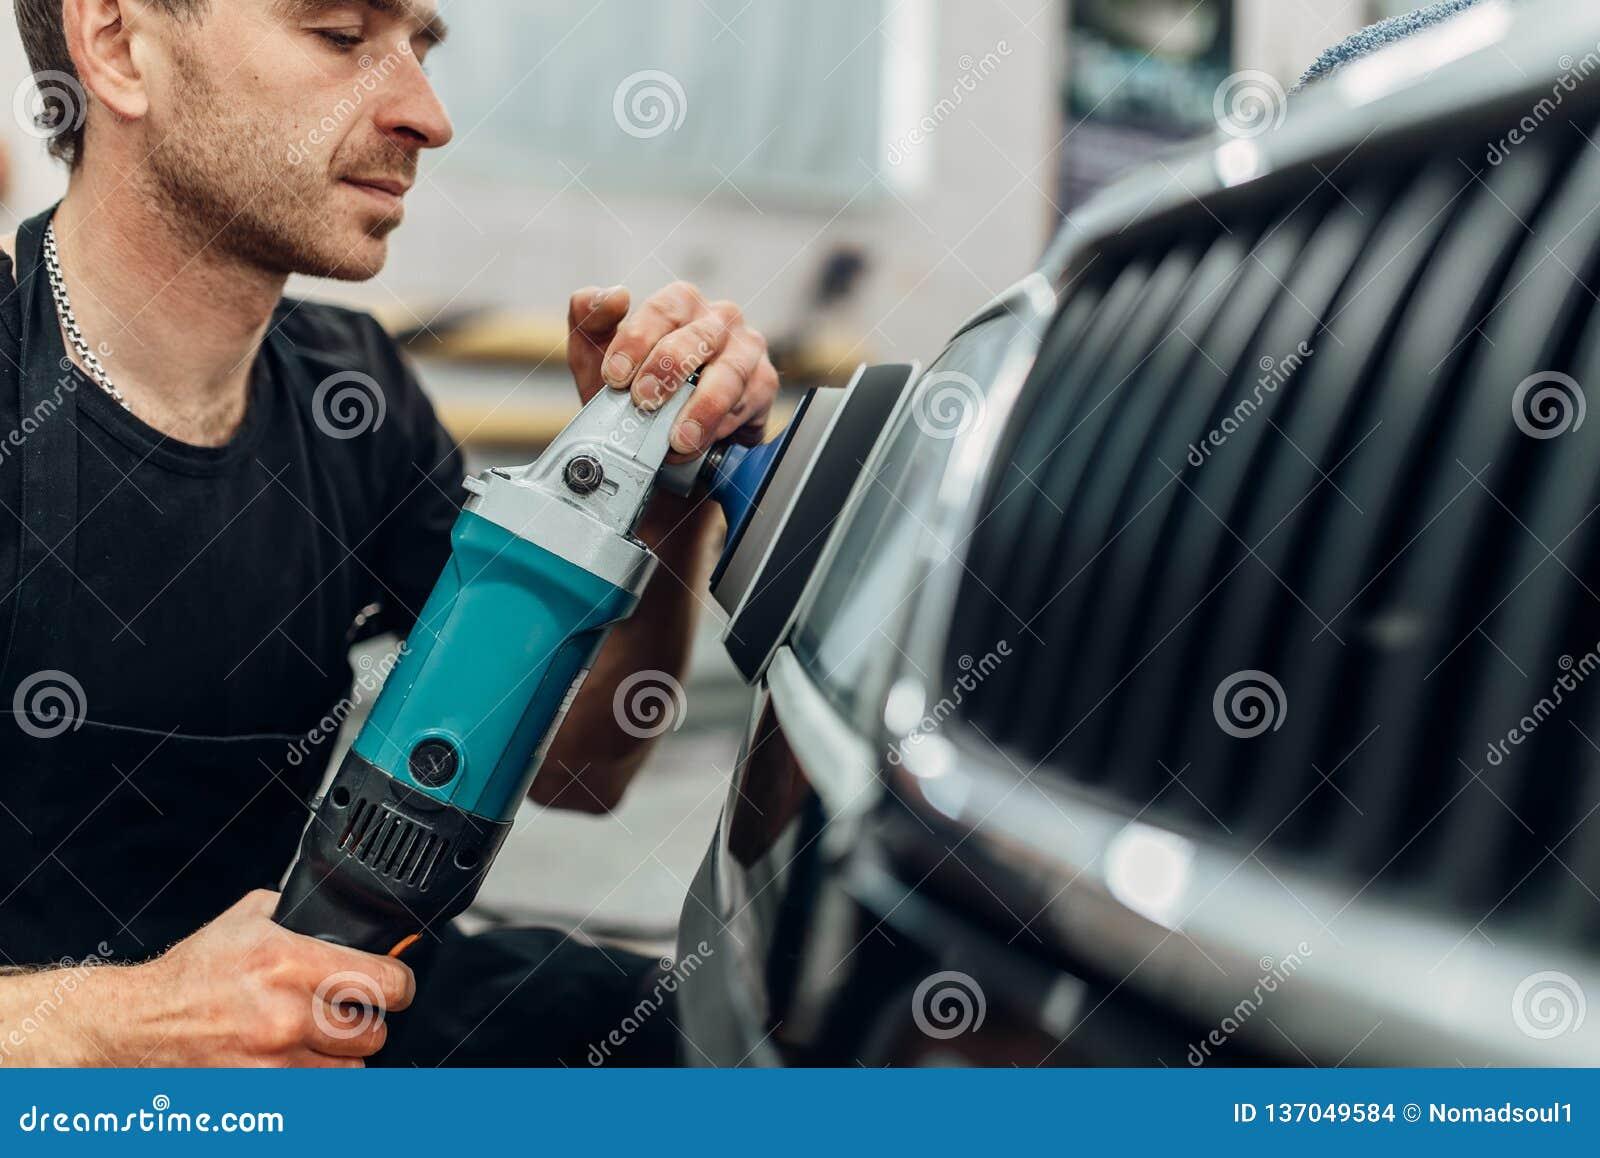 Detailing Of Car Headlight On Car-wash Service Stock Photo ...